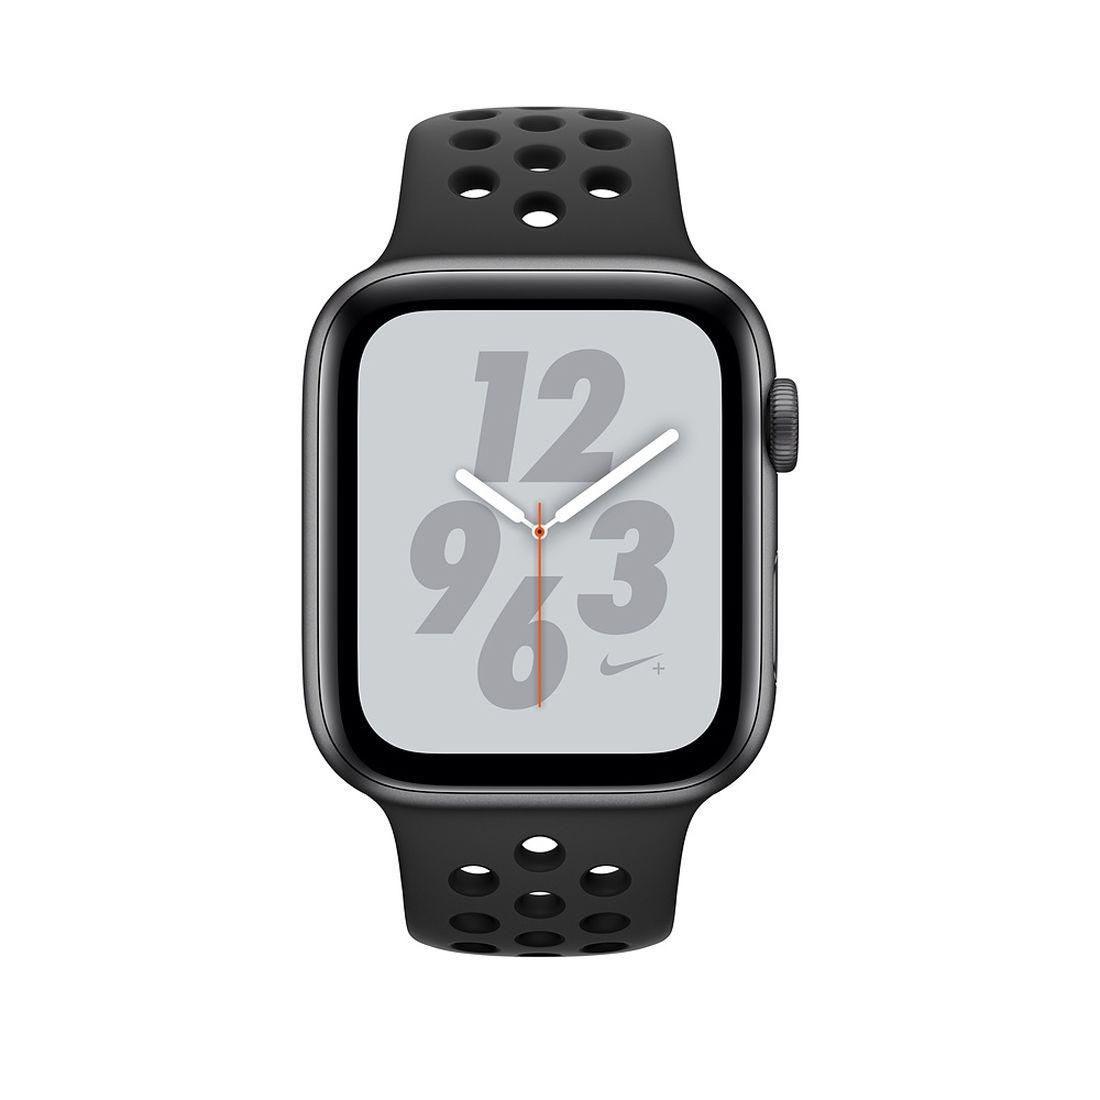 8a799f55717 relógio apple watch series 4 nike gps+ celular black sport. Carregando zoom.